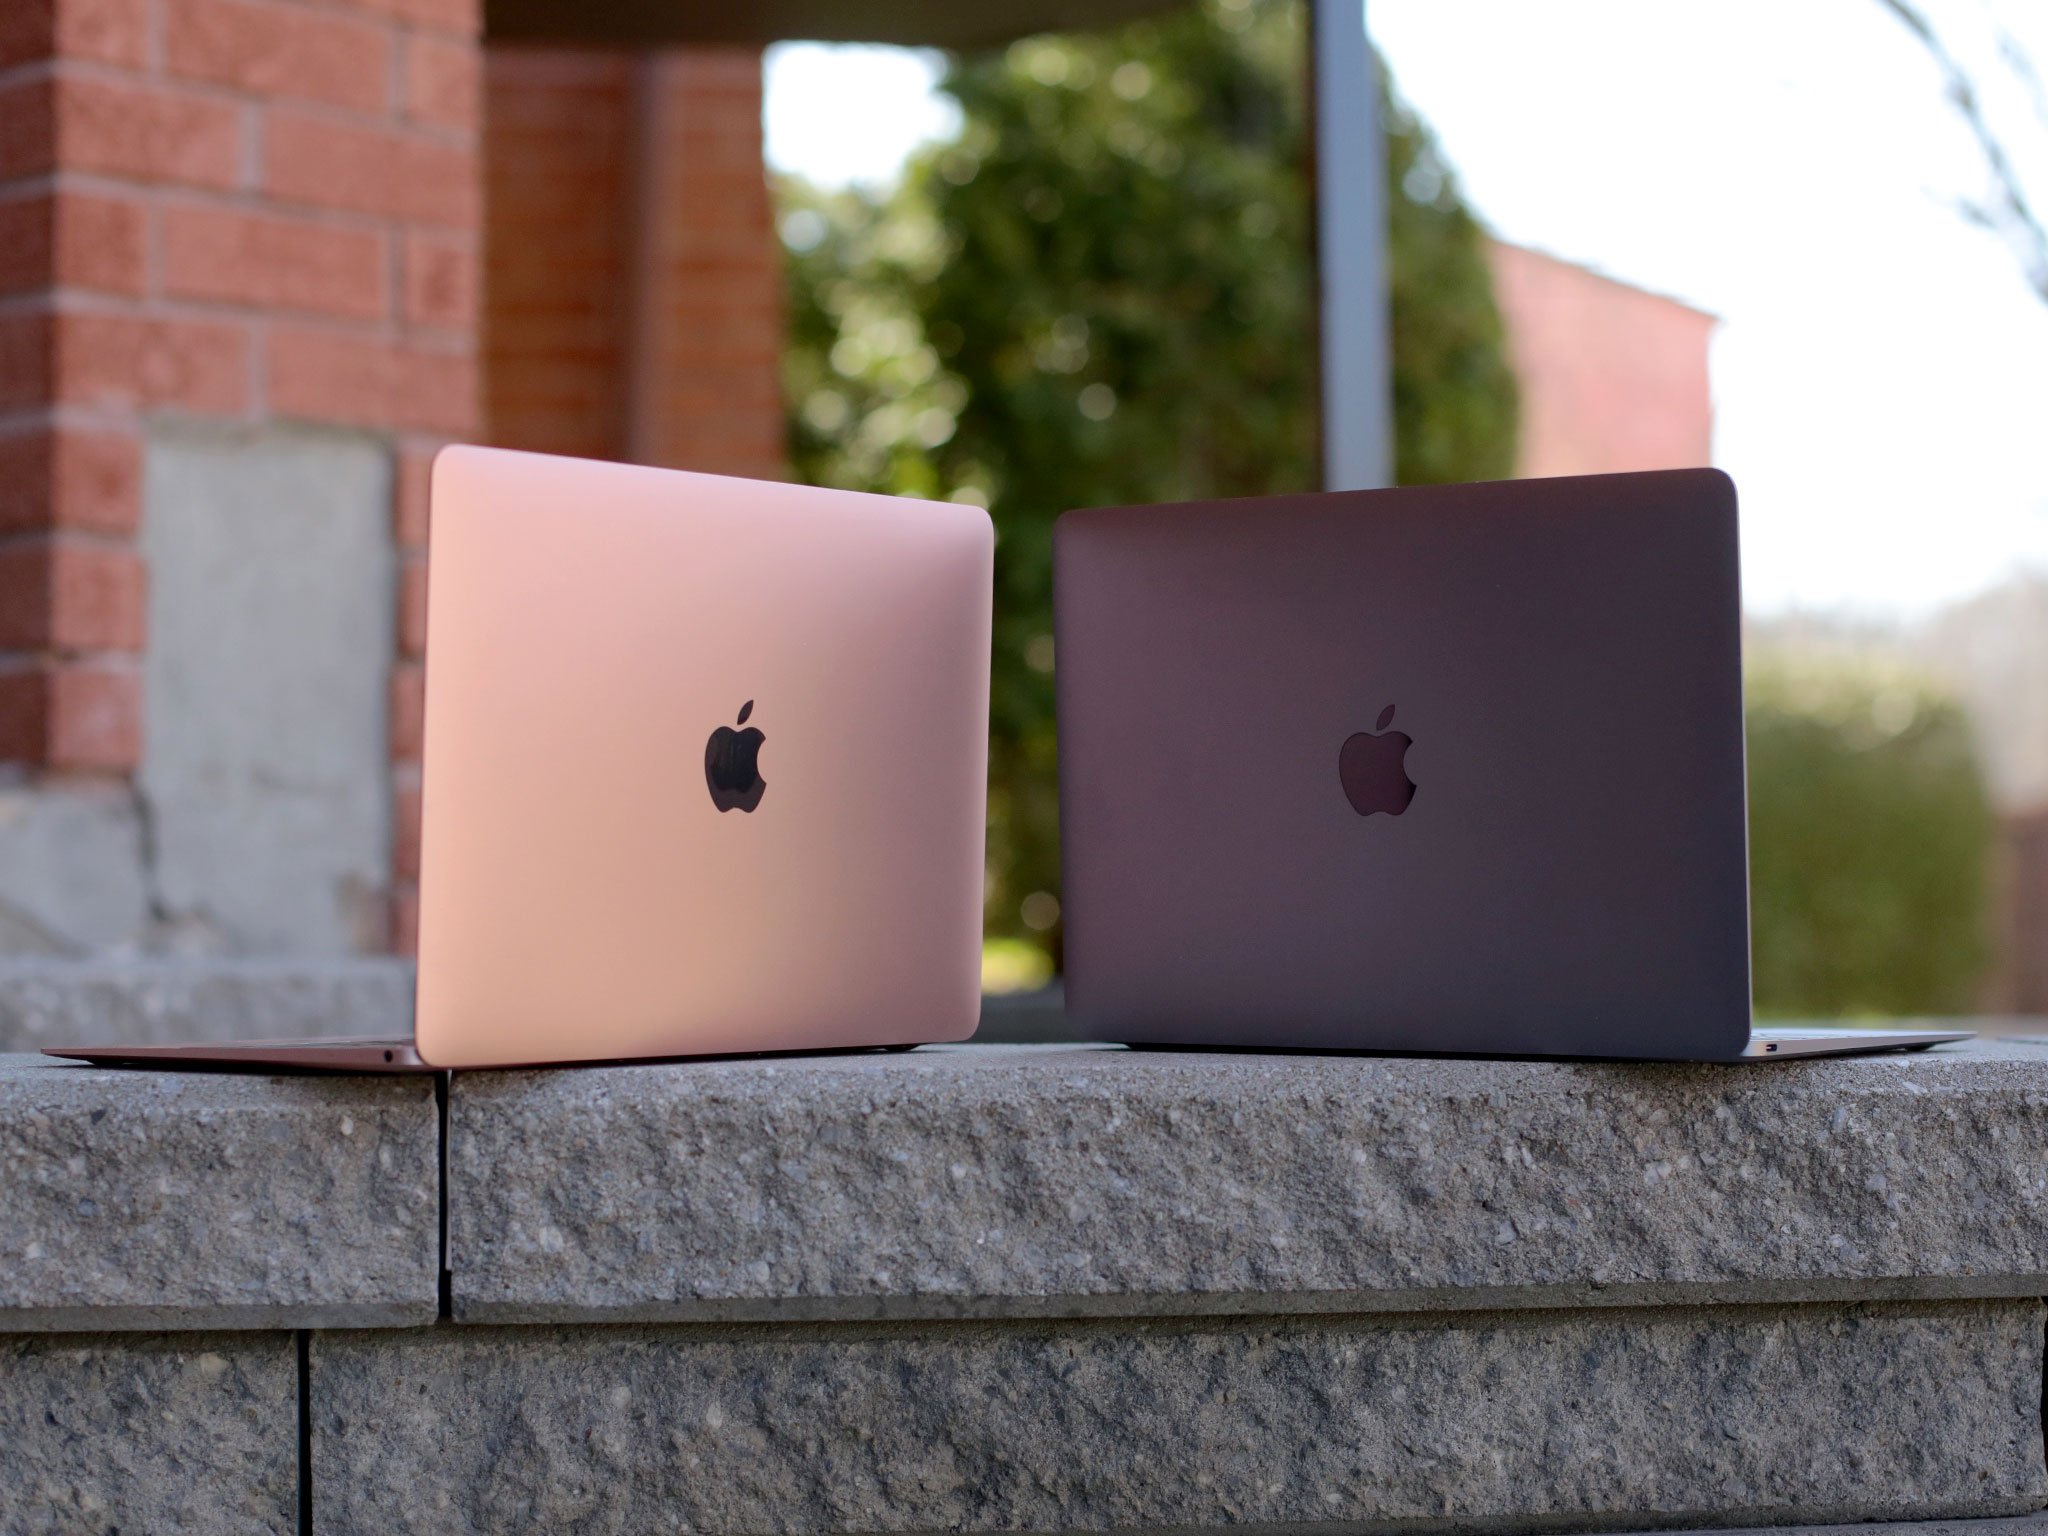 Macbook . Air Pro Apple